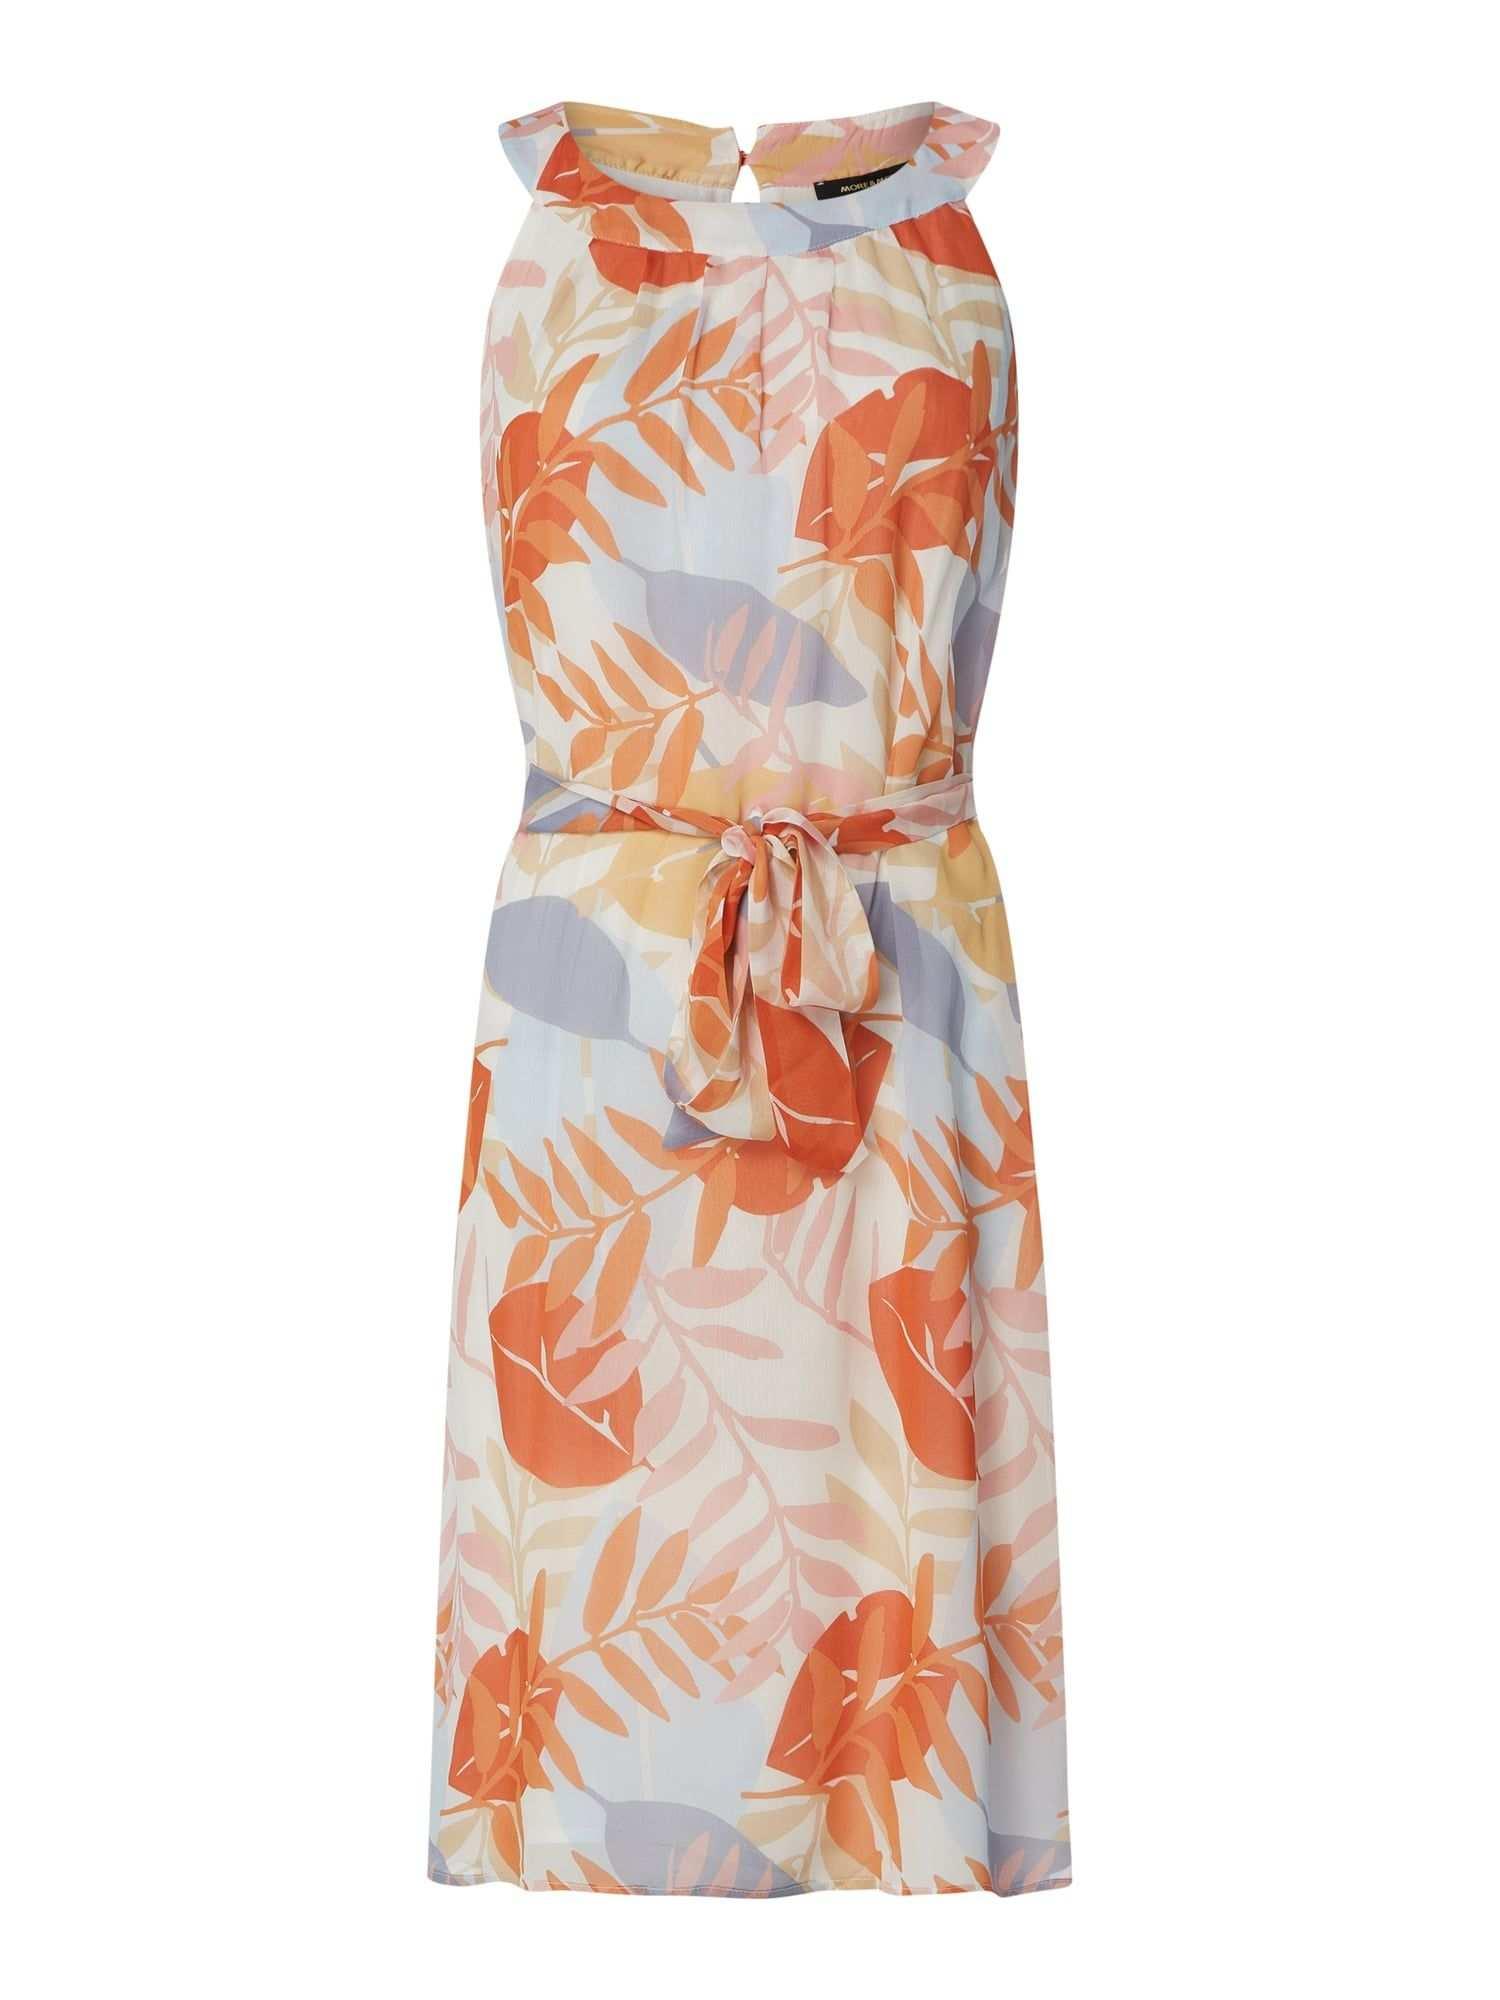 More More Kleid Mit Floralem Muster In Orange Online Kaufen 1101377 P C Online Shop In 2020 More And More Kleid Floral Muster Freizeitkleider